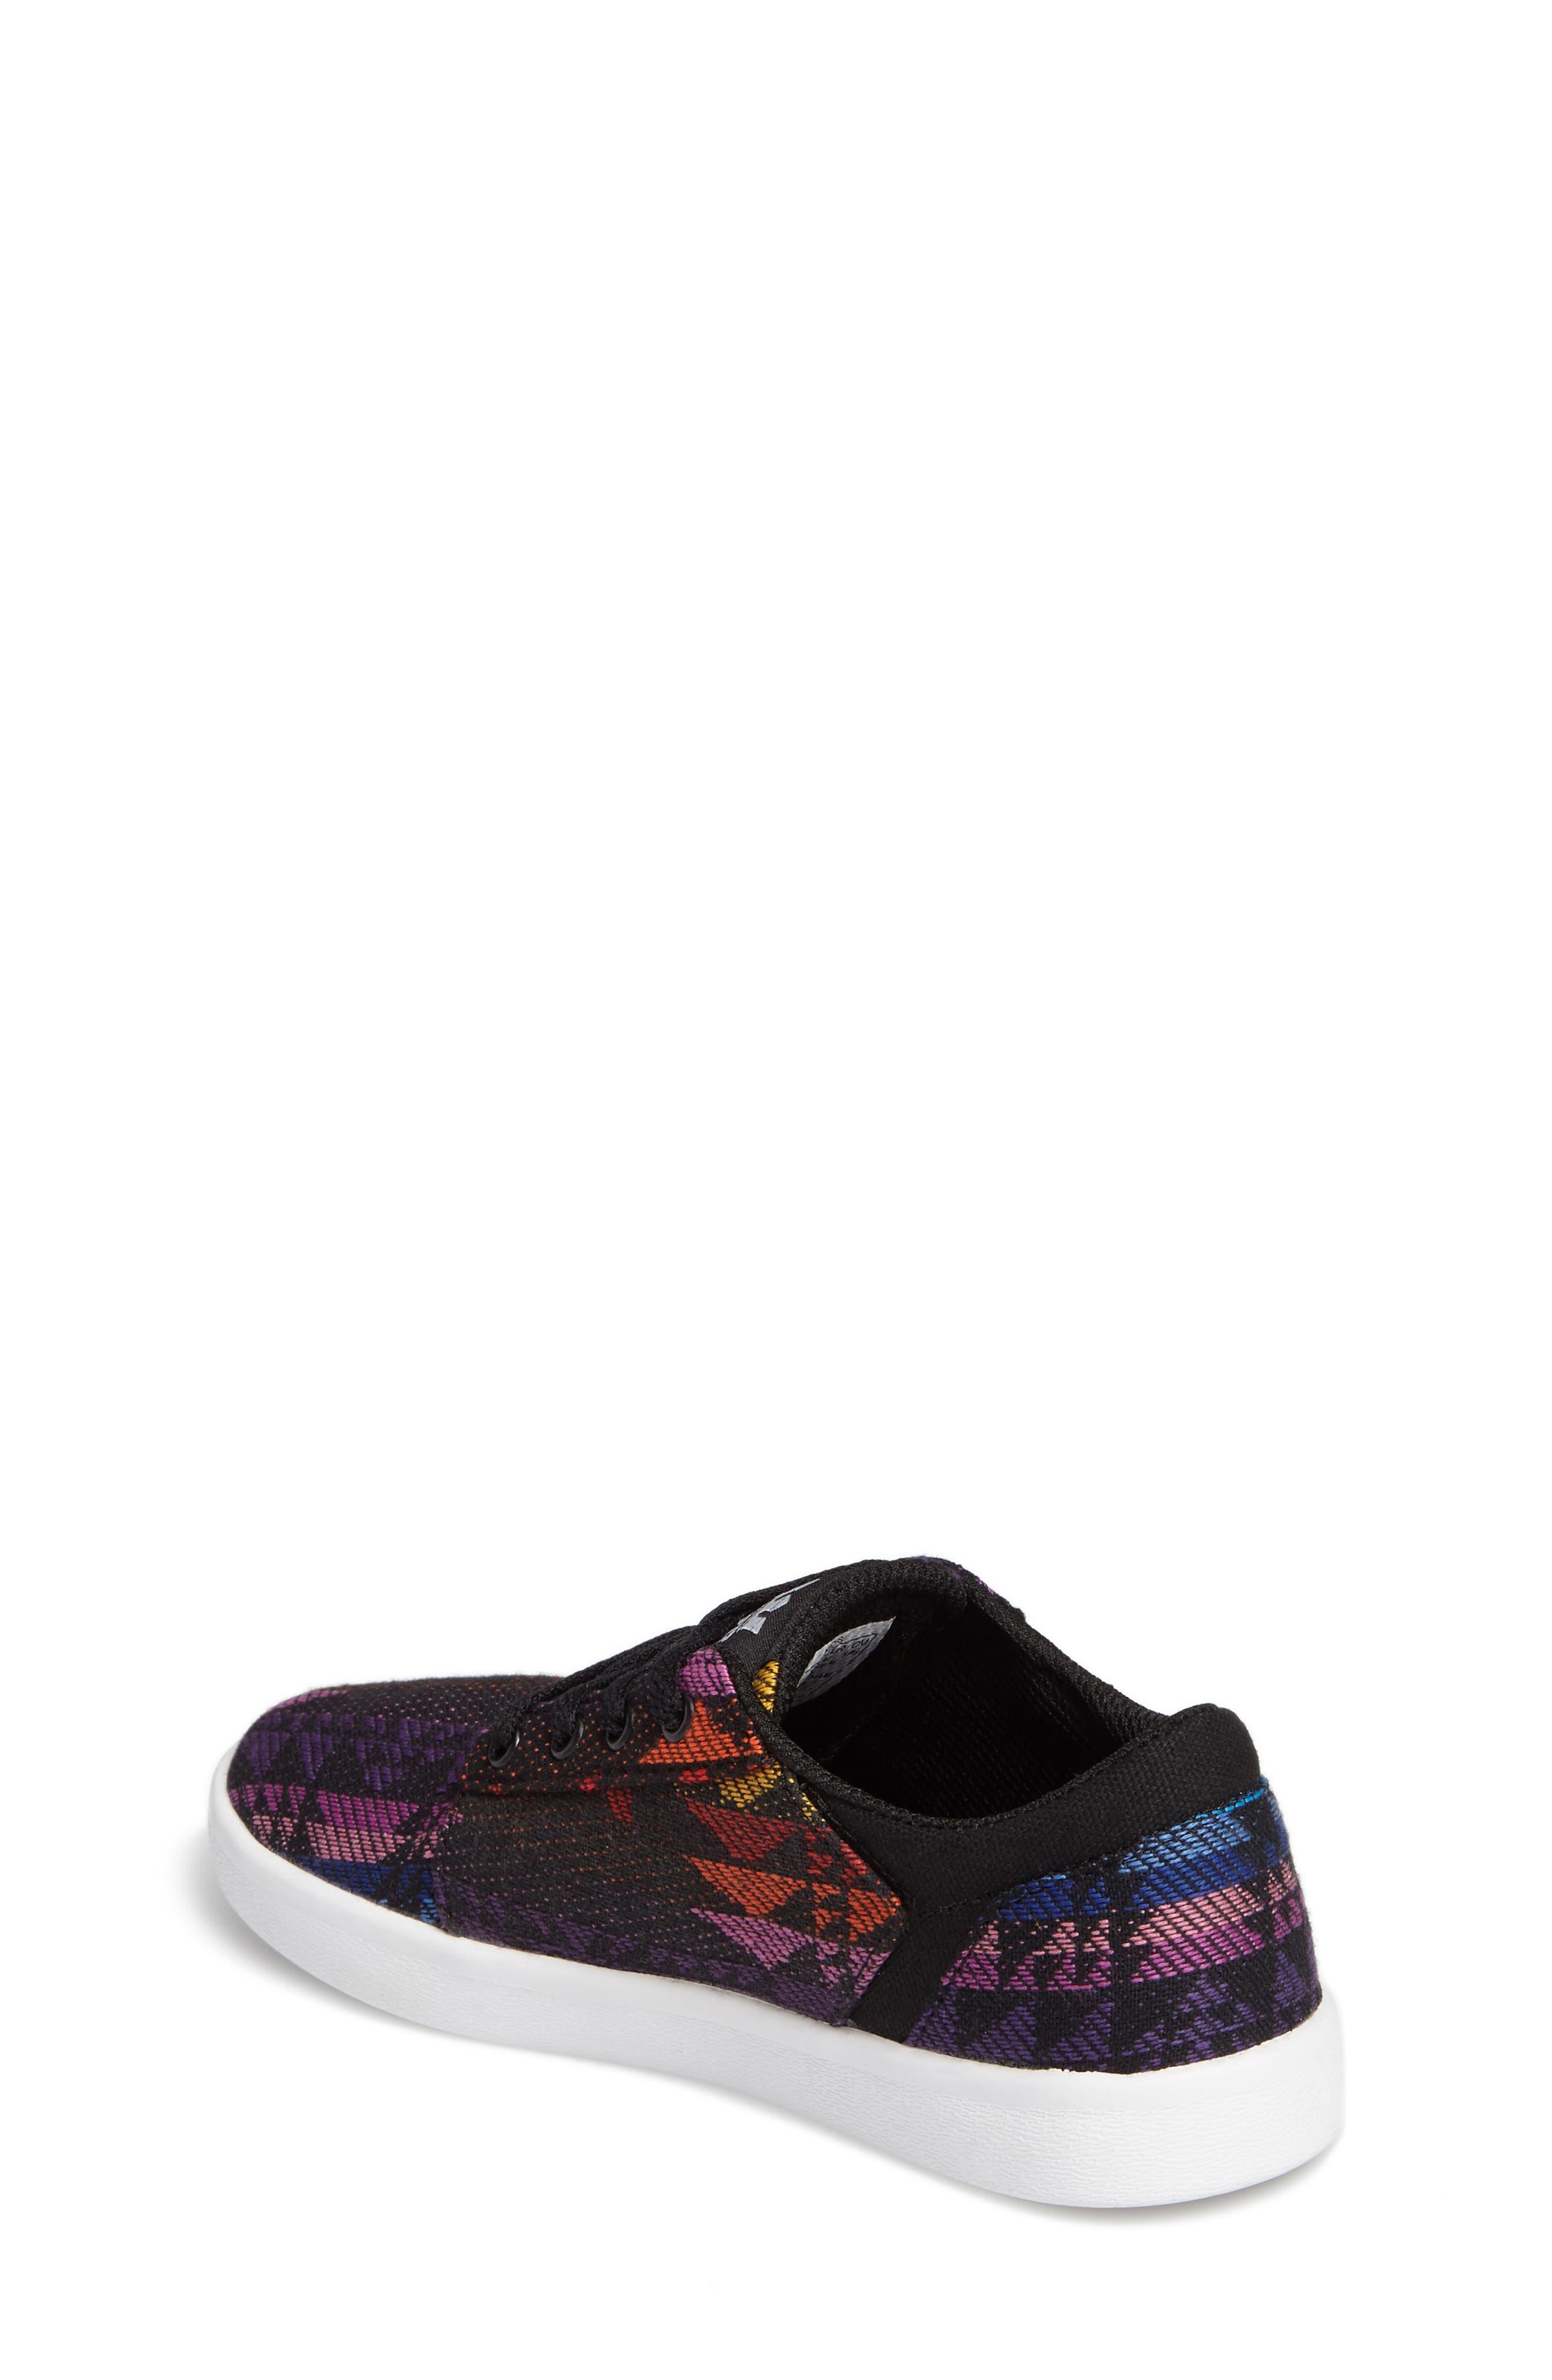 Alternate Image 2  - Supra Yorek Low Top Sneaker (Toddler, Little Kid & Big Kid)